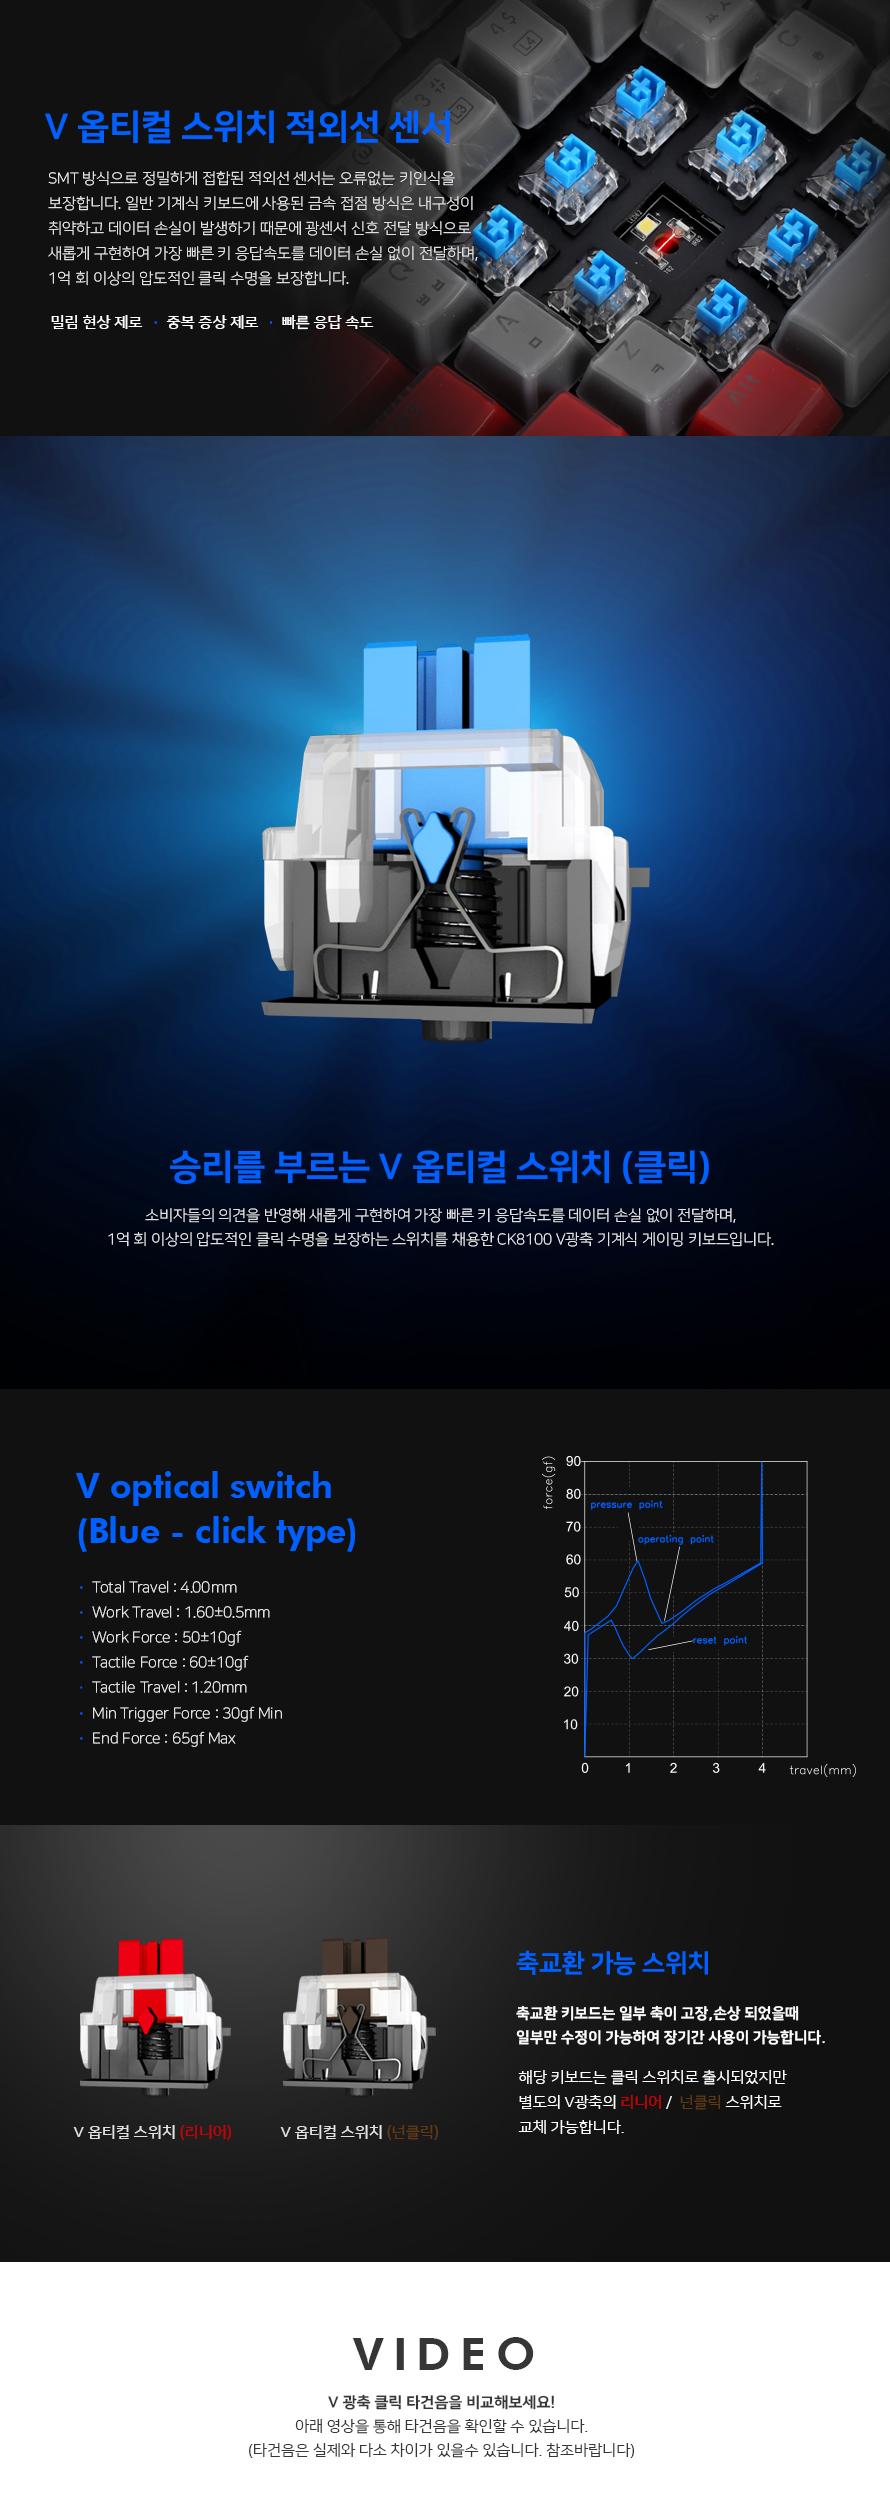 COX  CK8100 V광축 완전방수 크리스탈 키캡 교체축 사이드 RGB 게이밍(S1, 클릭)